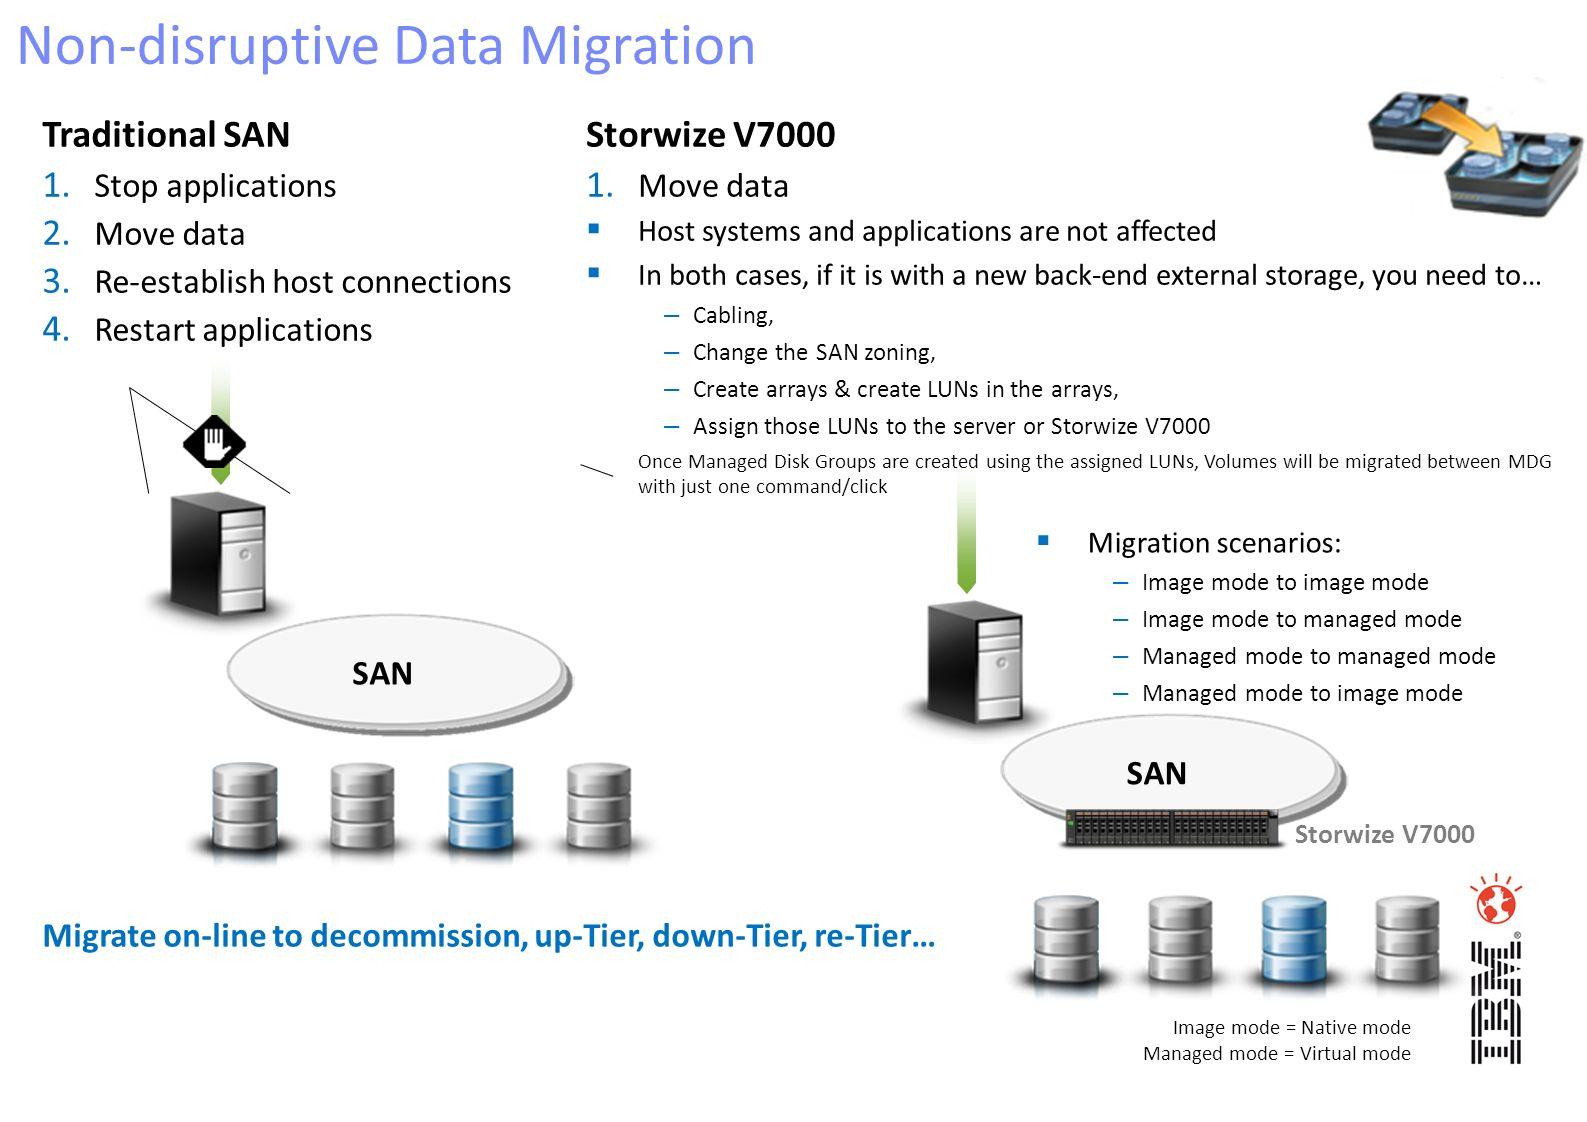 Non-disruptive Data Migration Traditional SAN 1. Stop applications 2. Move data 3. Re-establish host connections 4. Restart applications Storwize V700